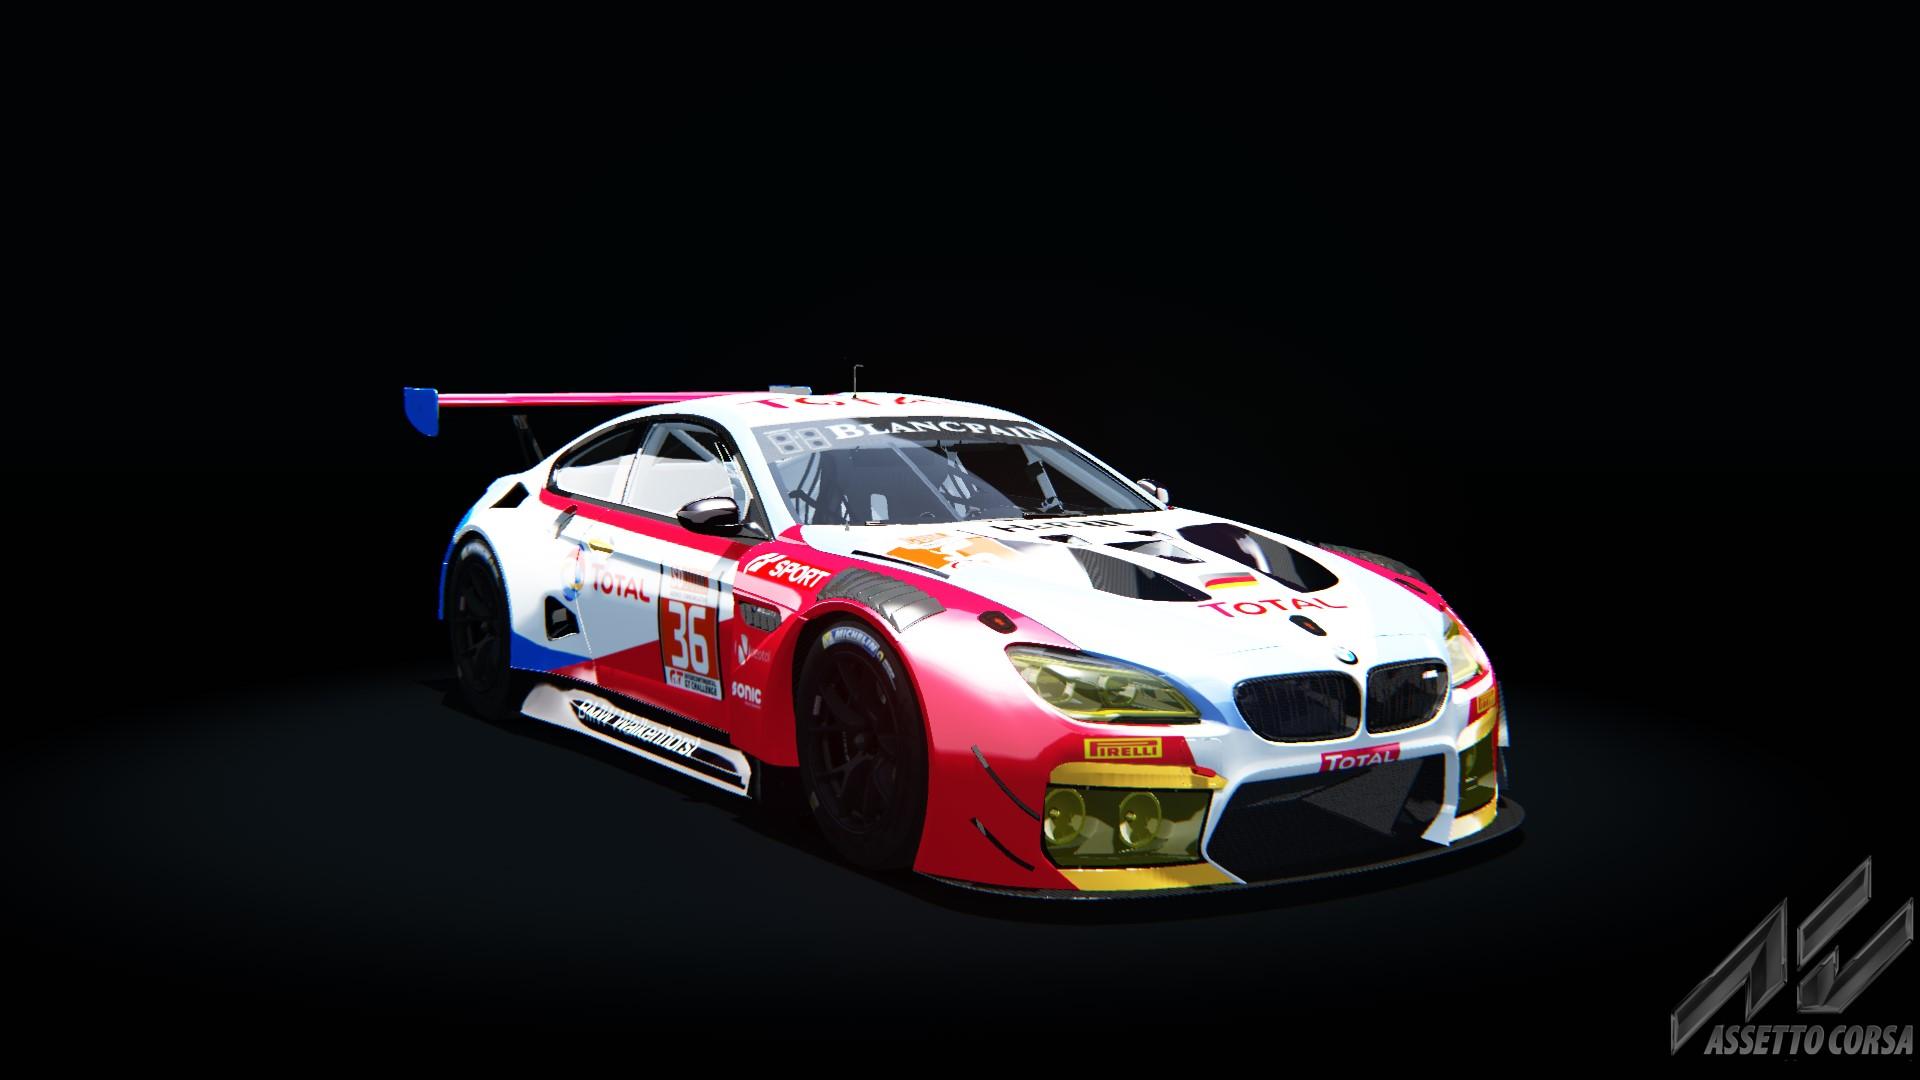 Bmw M6 Gt3 Walkenhorst Motorsports 36 24h Spa 2017